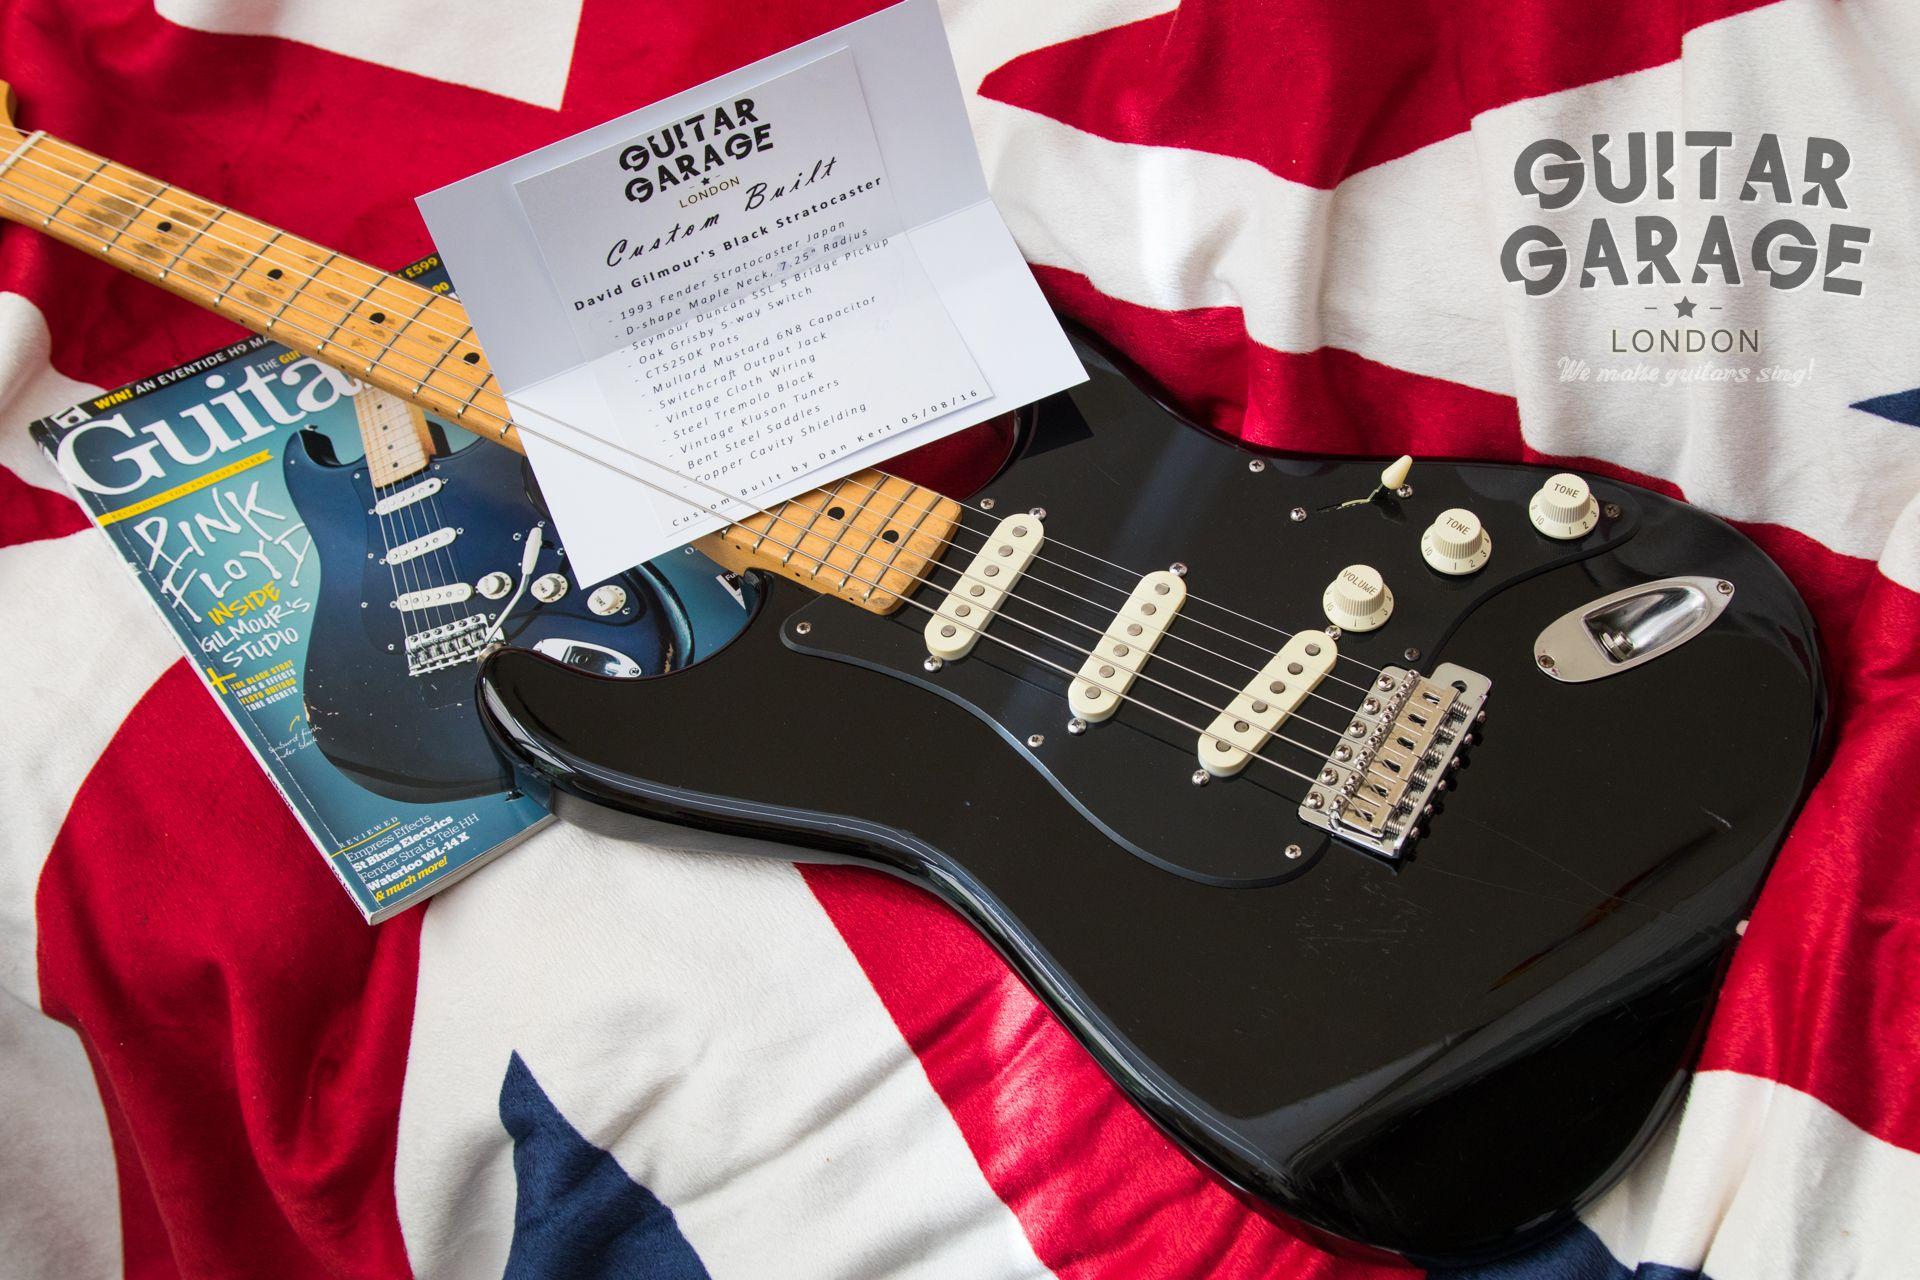 David Gilmour Black Strat Bridge Pickup Wiring Trusted Diagrams Emg Diagram Guitar Garage London Custom Built Dave Gilmours Based Stratocaster